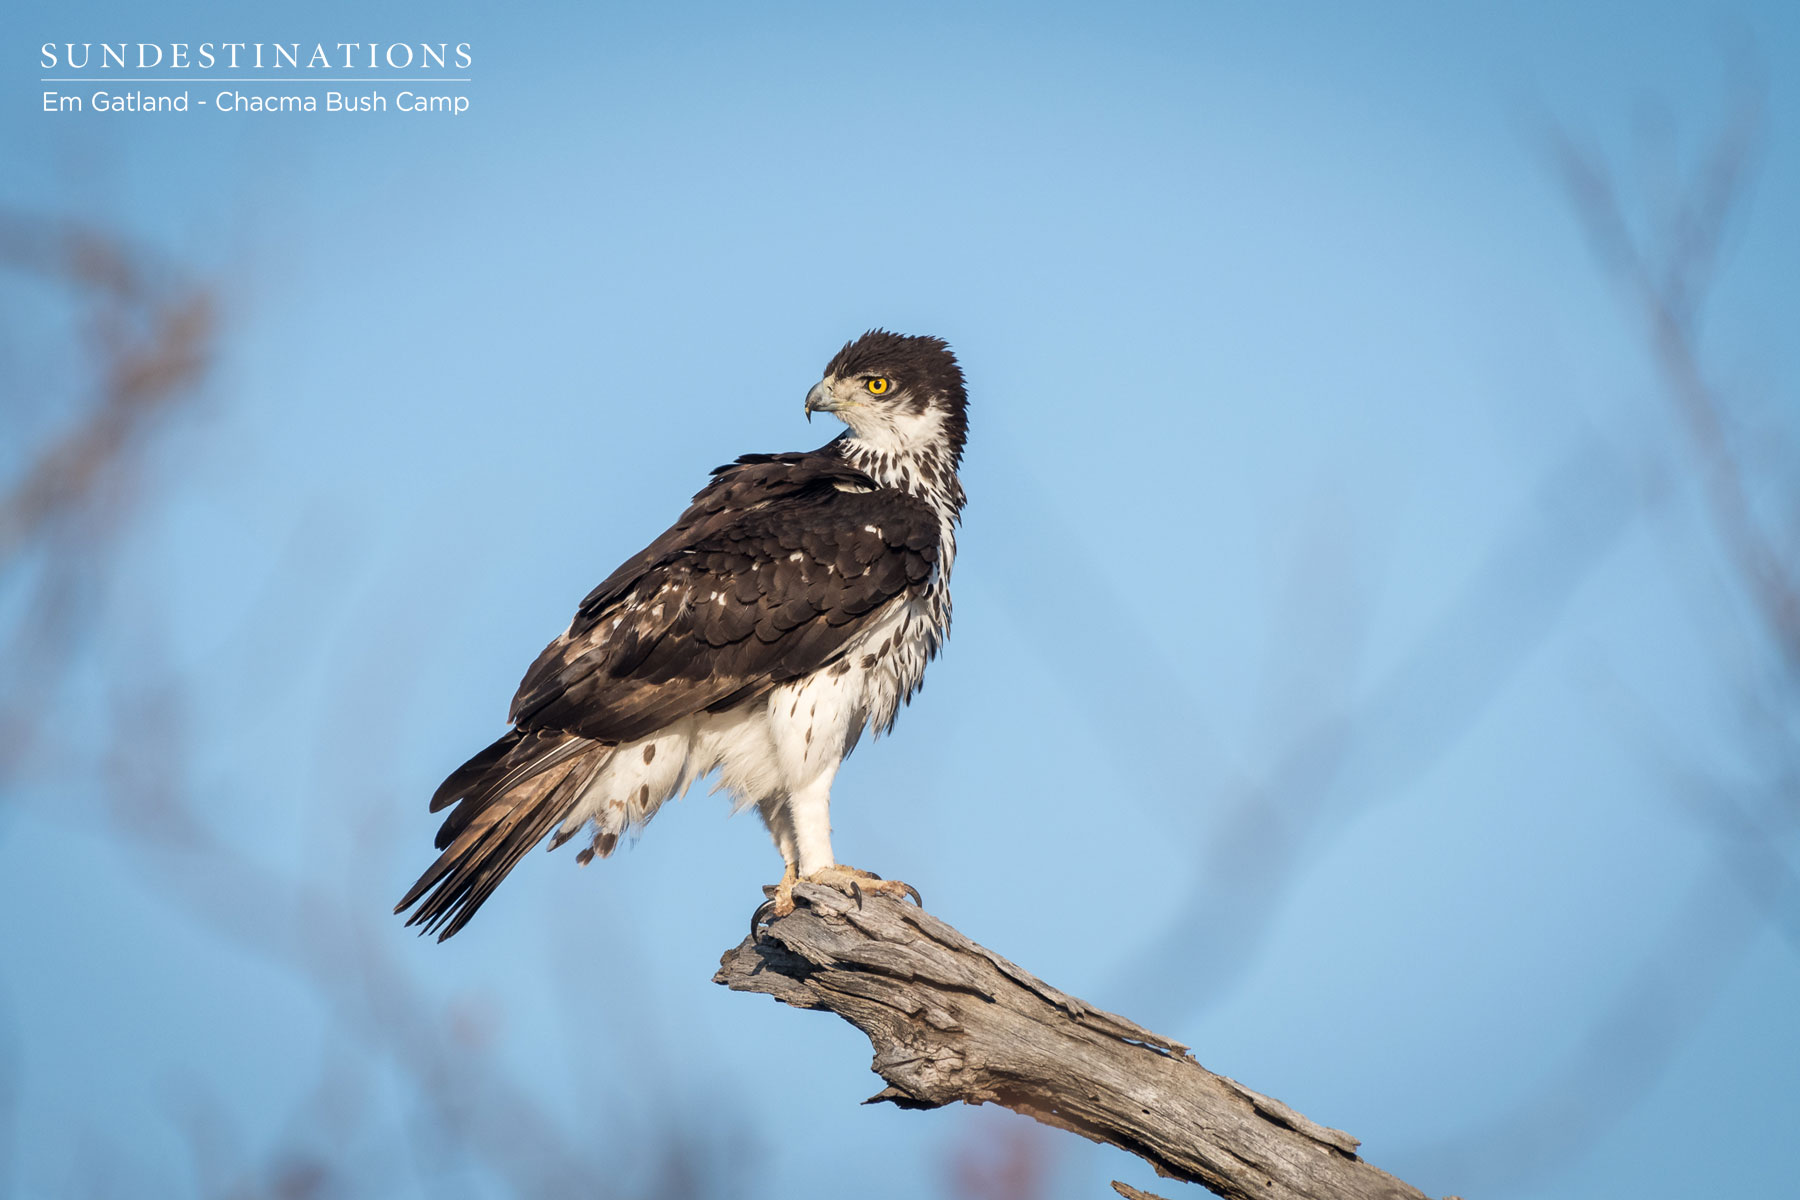 An African Hawk Eagle